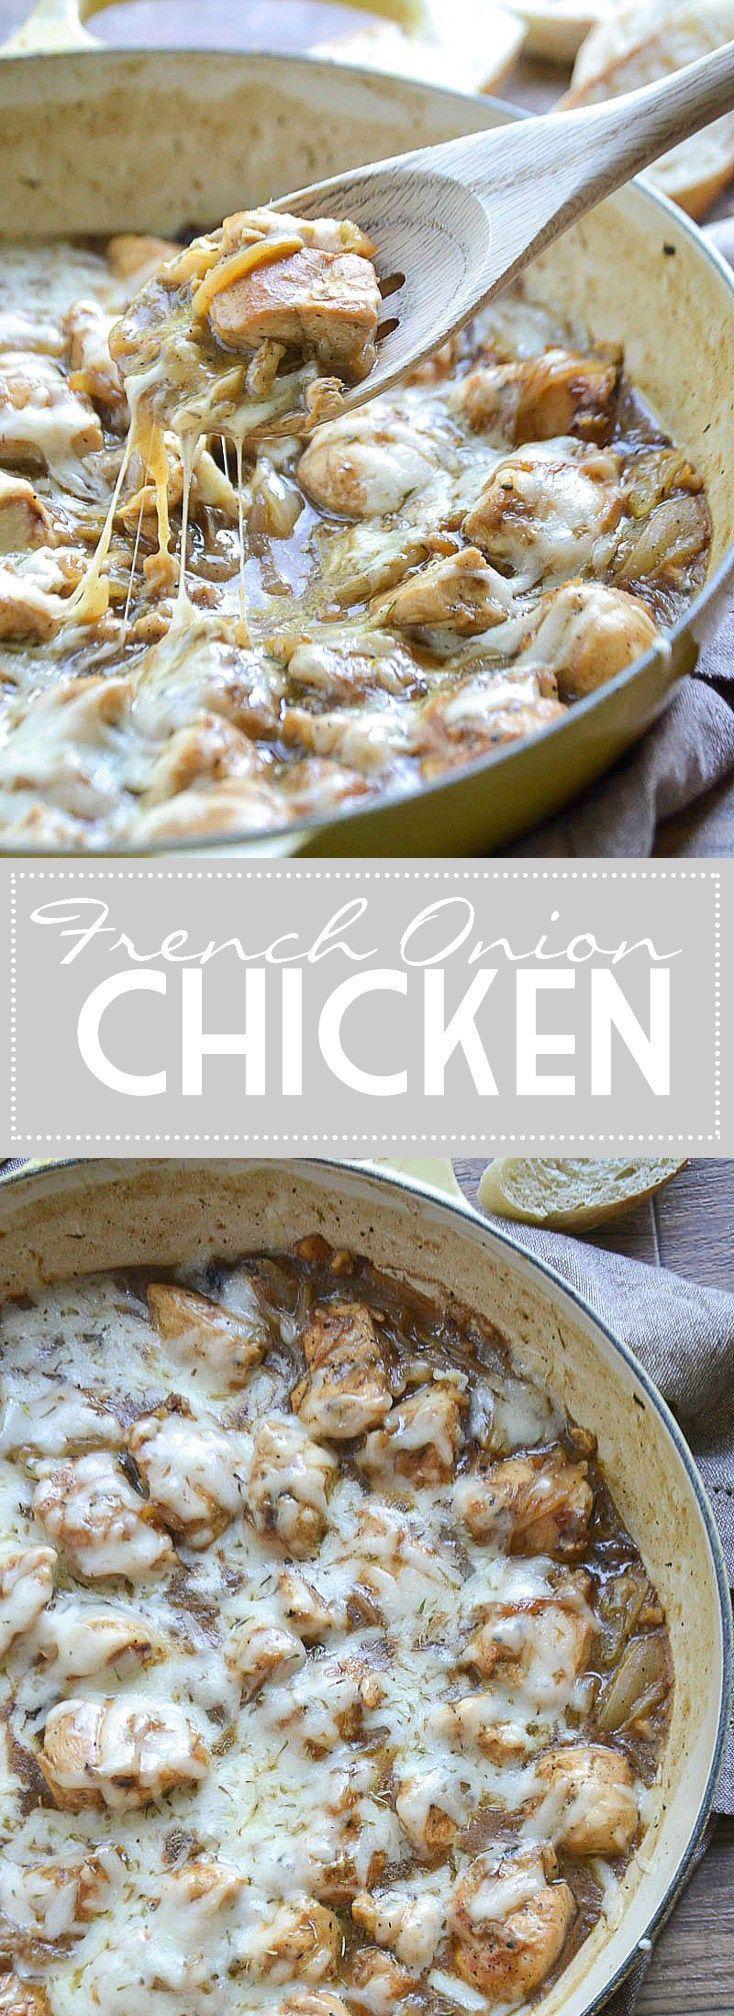 French Onion Chicken #falldinnerrecipes